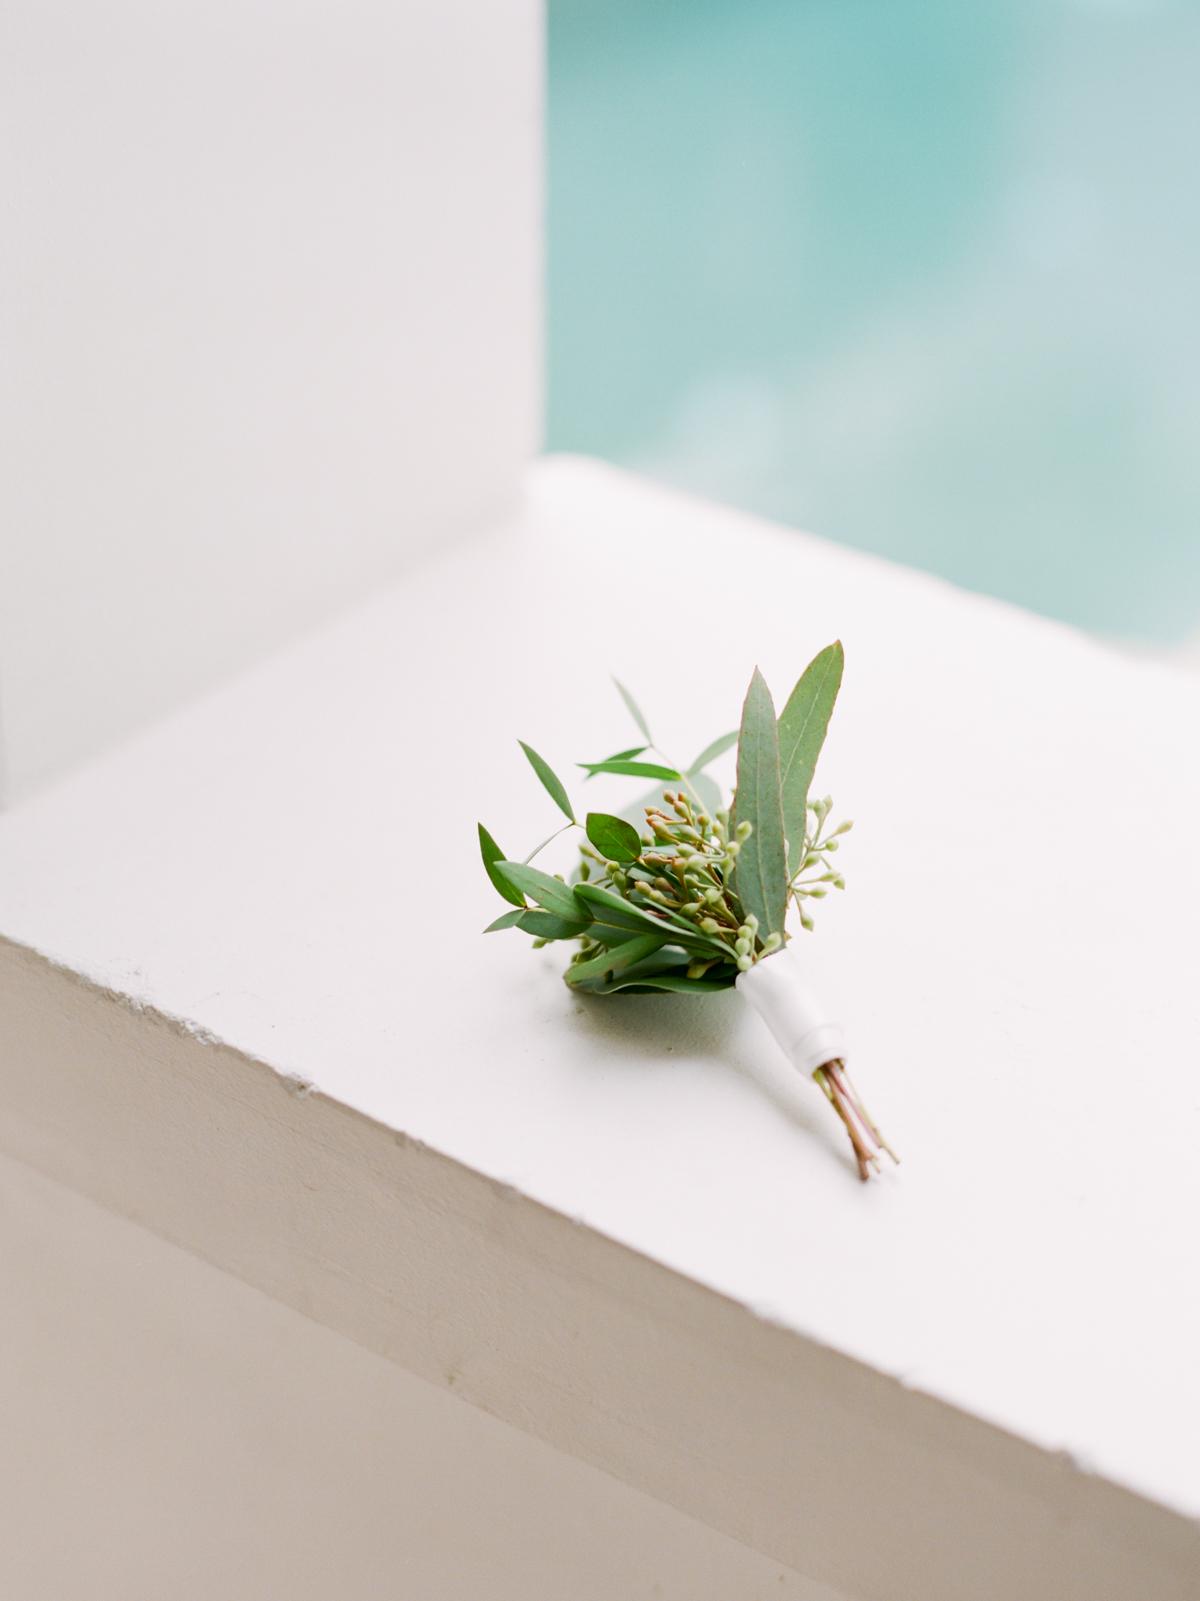 floralsbythesea-florist-alysbeach-wedding